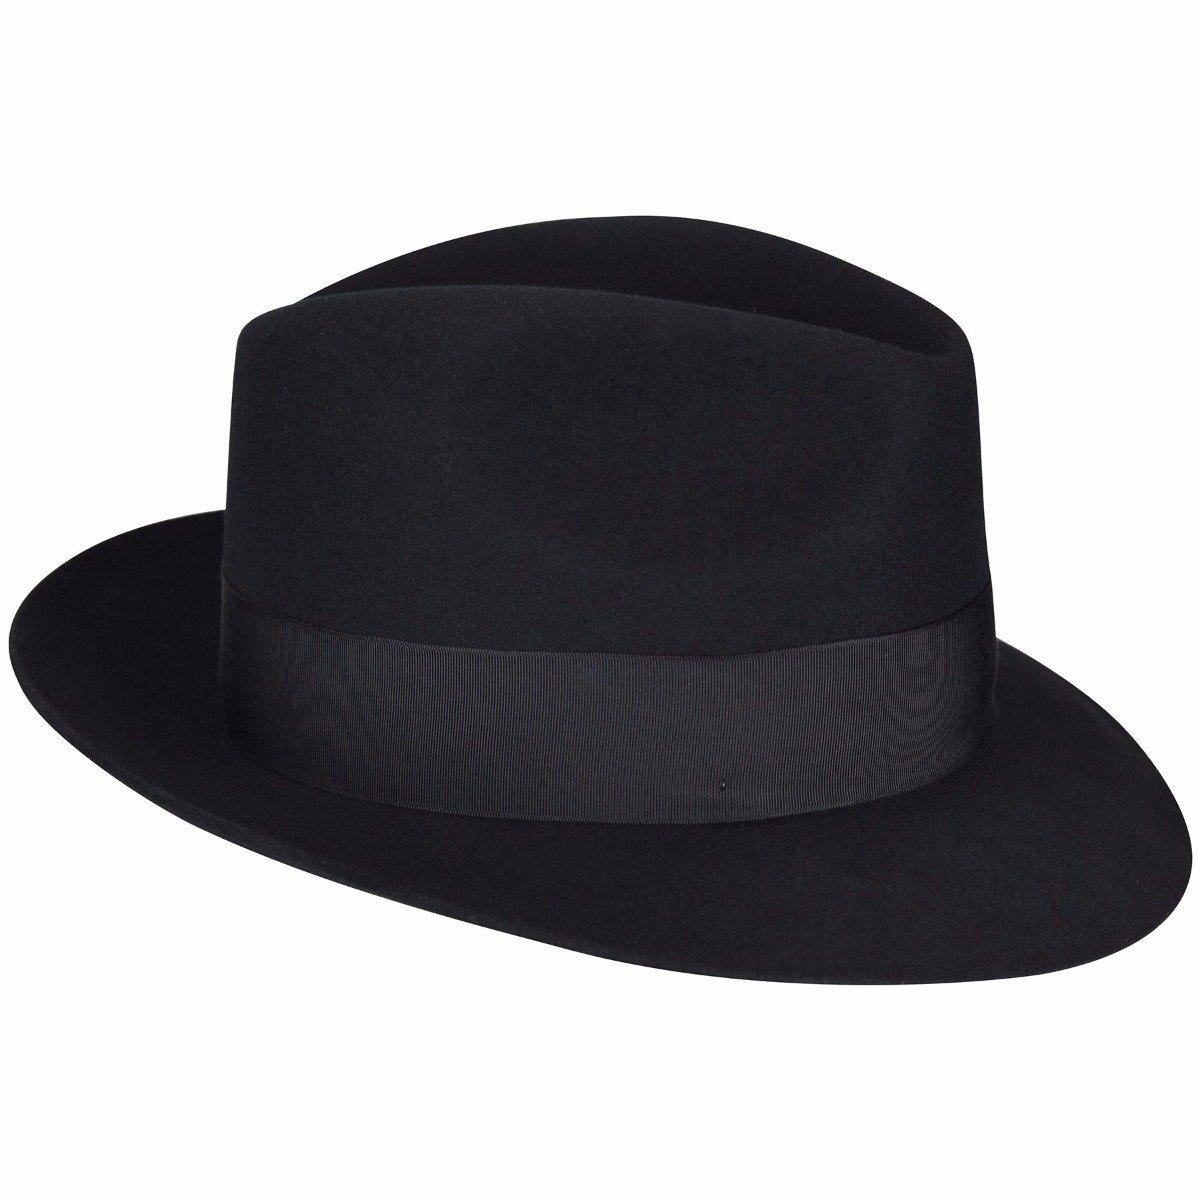 b24771b3b7b59 Bailey of Hollywood Men Gangster Fedora at Amazon Men s Clothing store